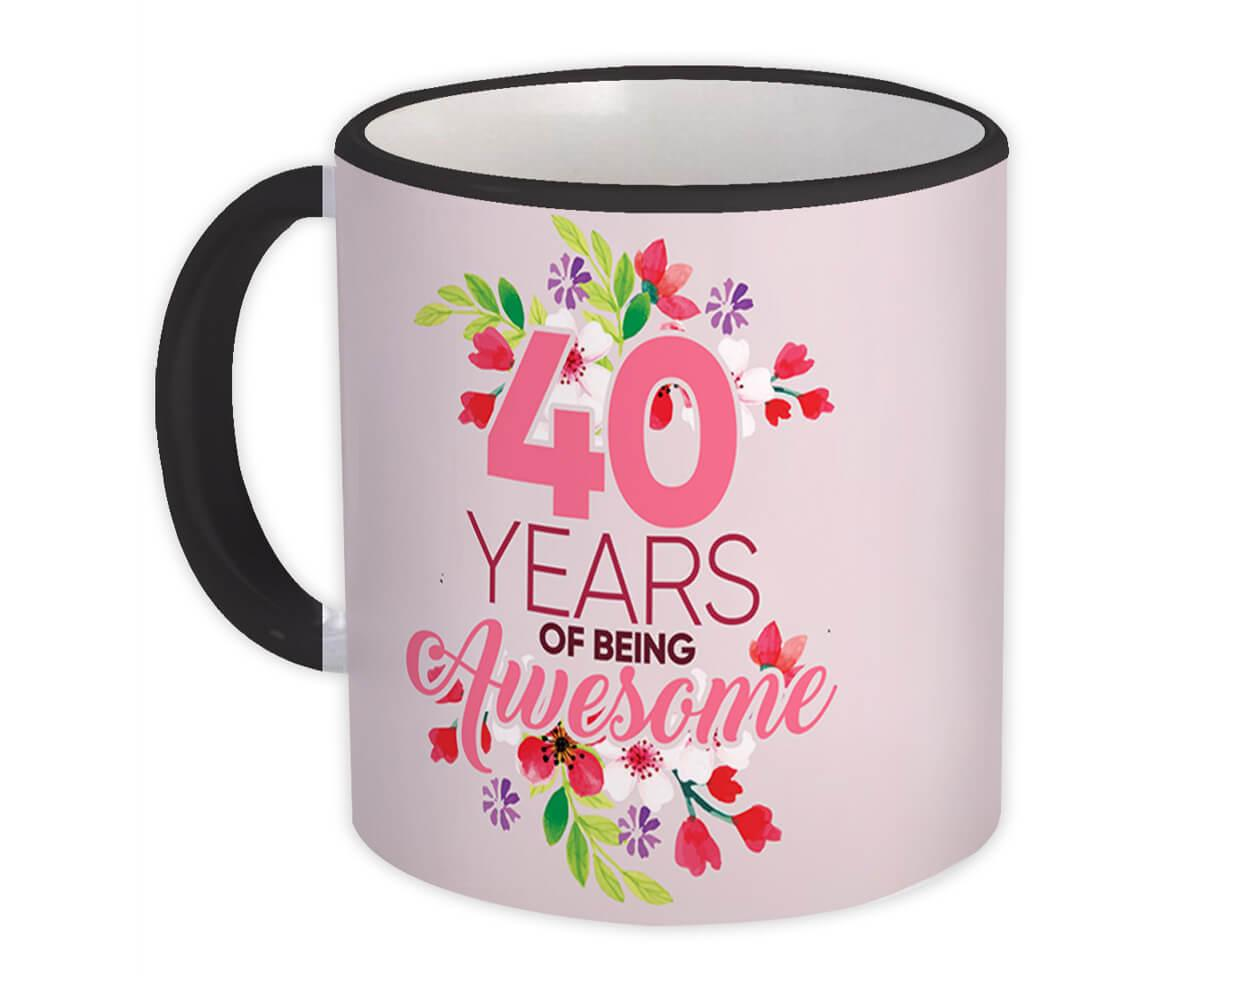 40 Years of Being Awesome : Gift Mug 40th Birthday Flower Girl Female Women Happy Cute